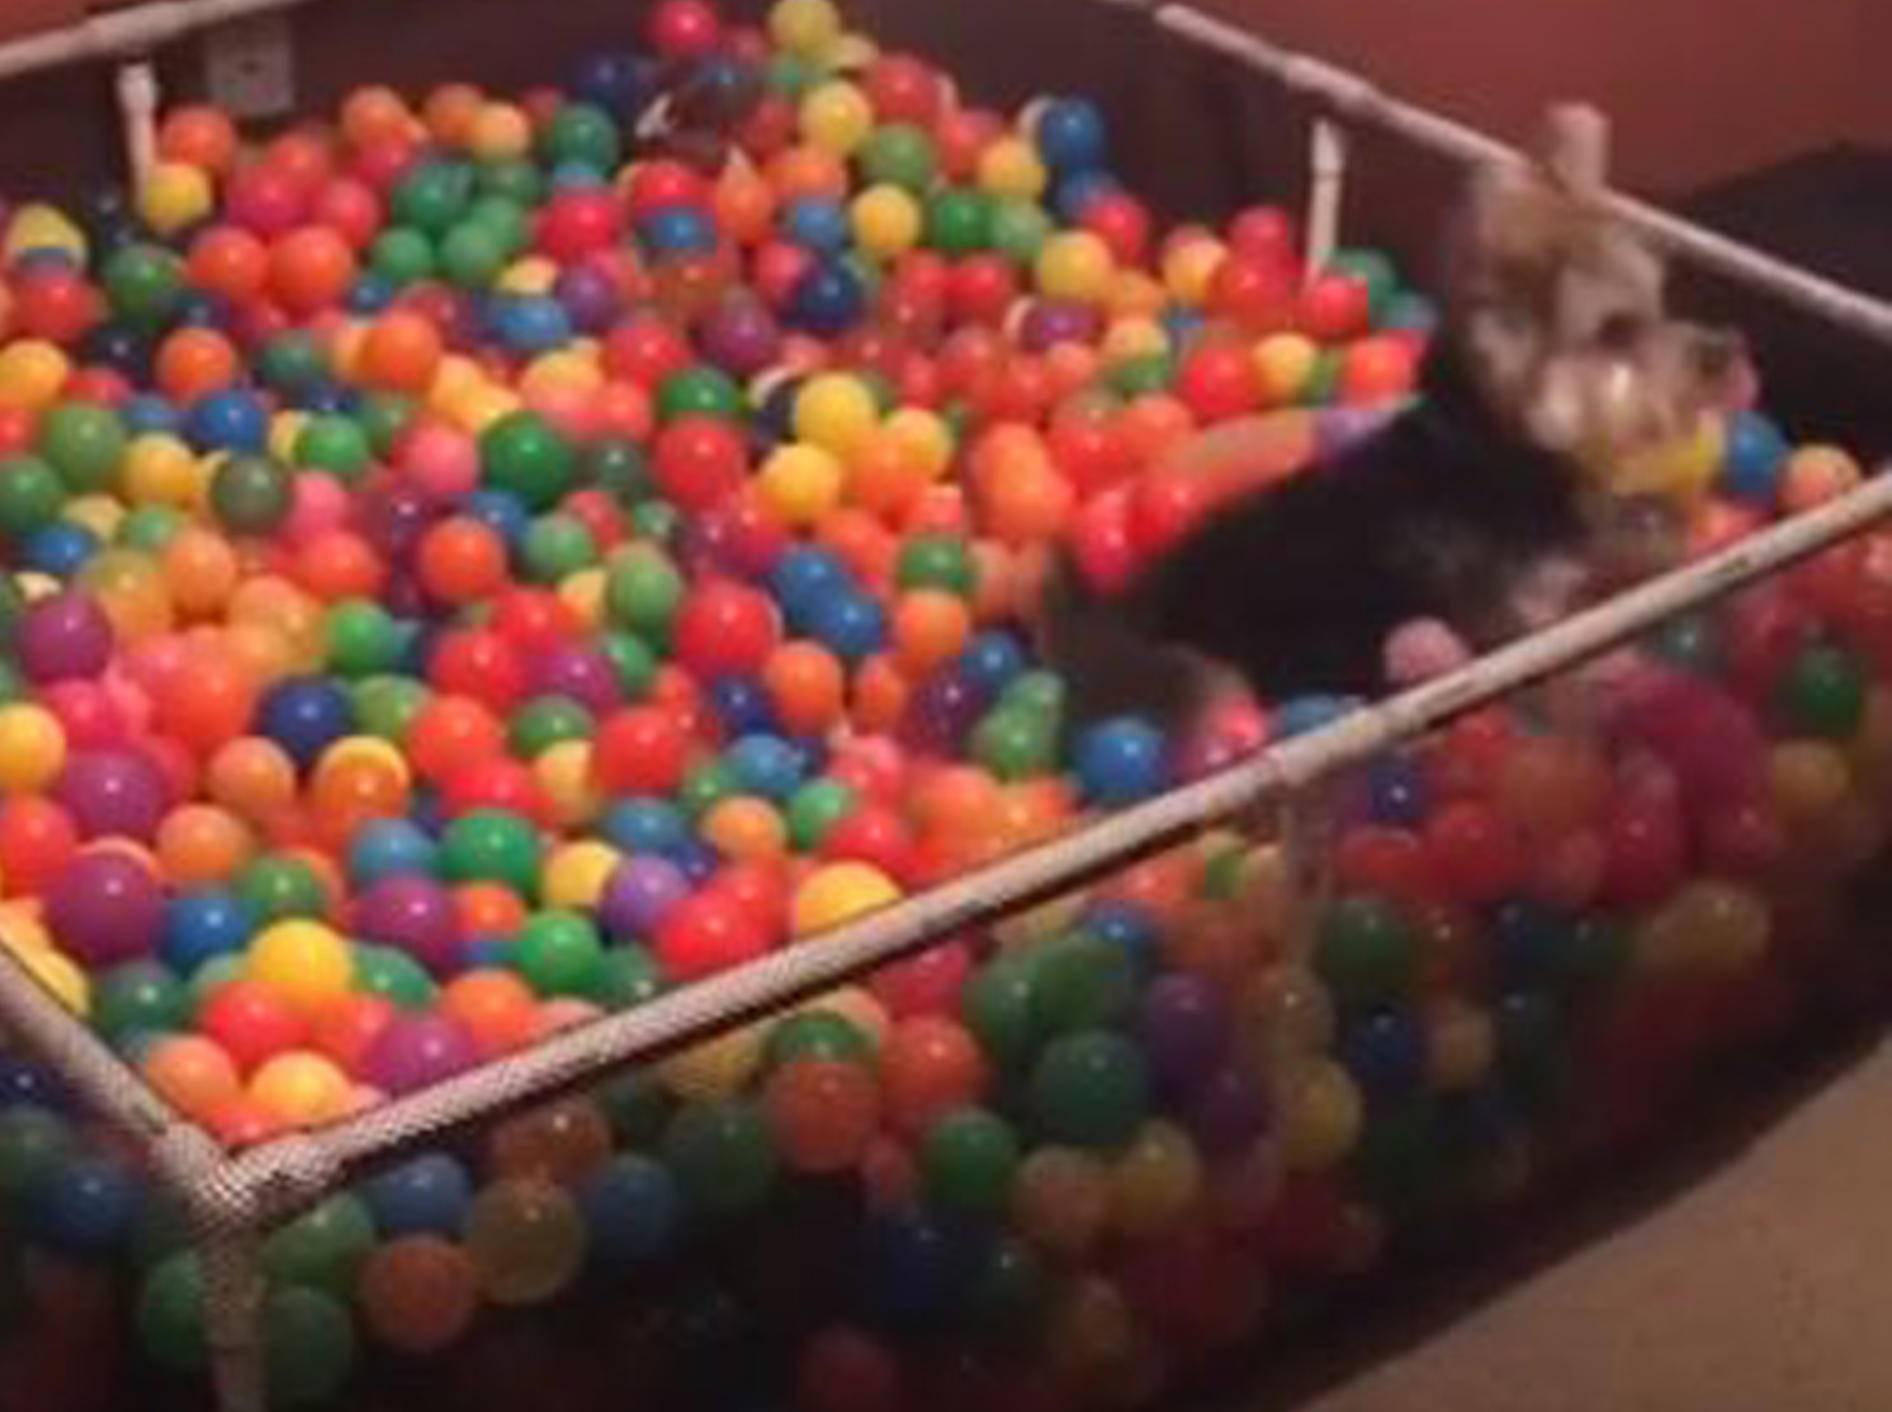 Hund hat Spaß im Bällebad - Bild: YouTube / LADbible